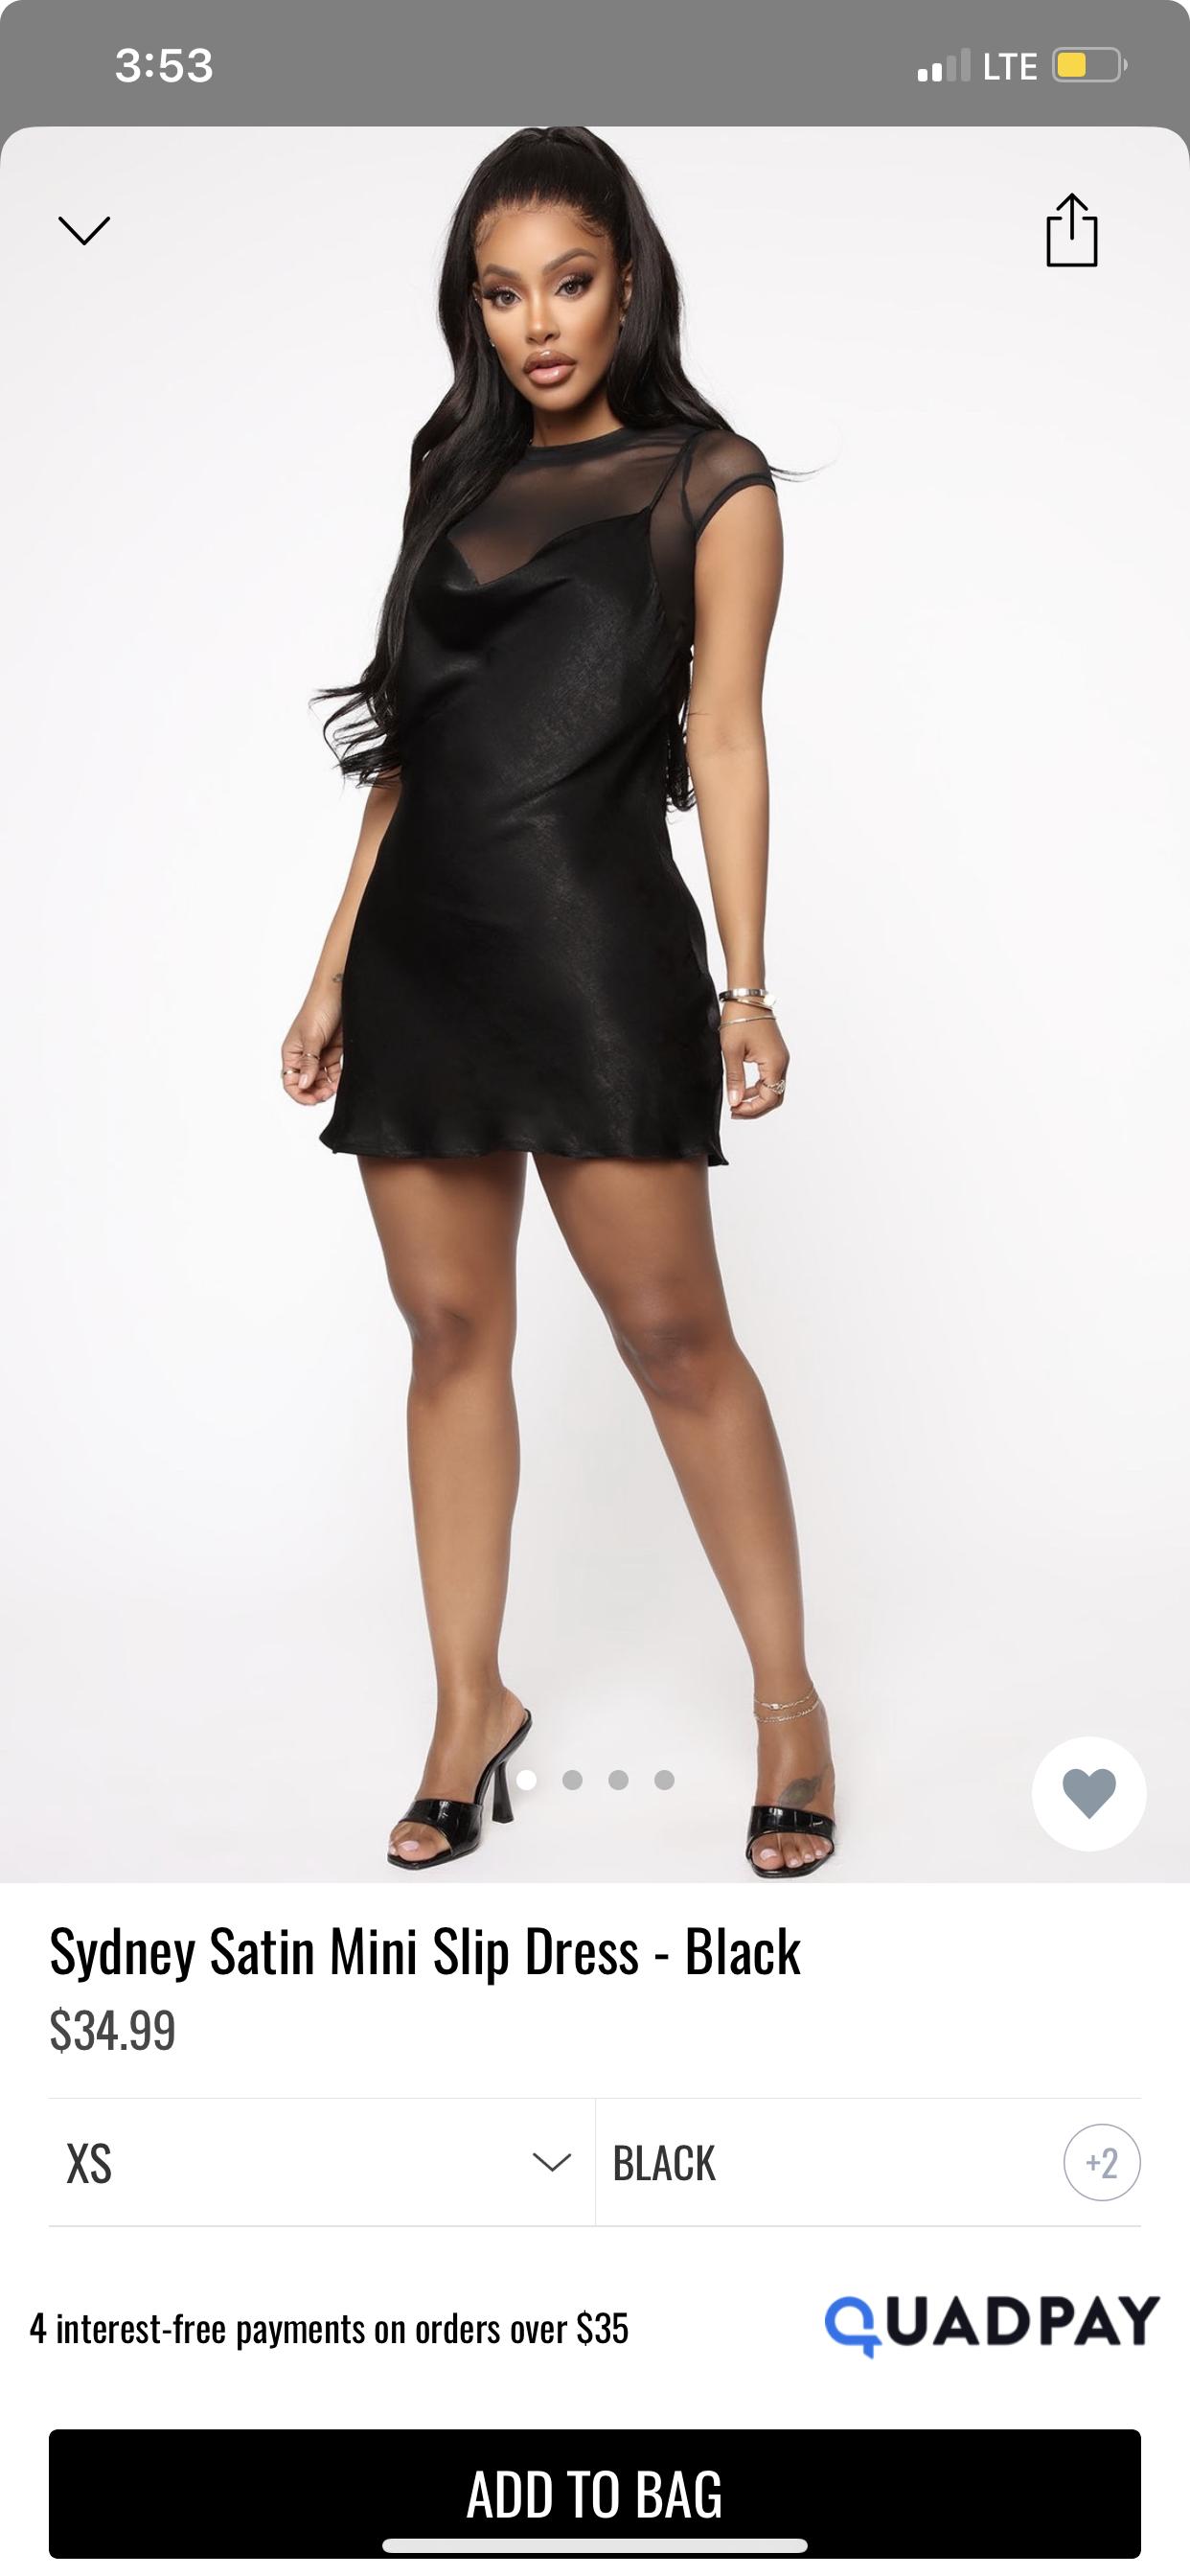 Sydney Satin Mini Slip Dress Black Slip Dress Mini Slip Dress Mini Slip [ 2688 x 1242 Pixel ]